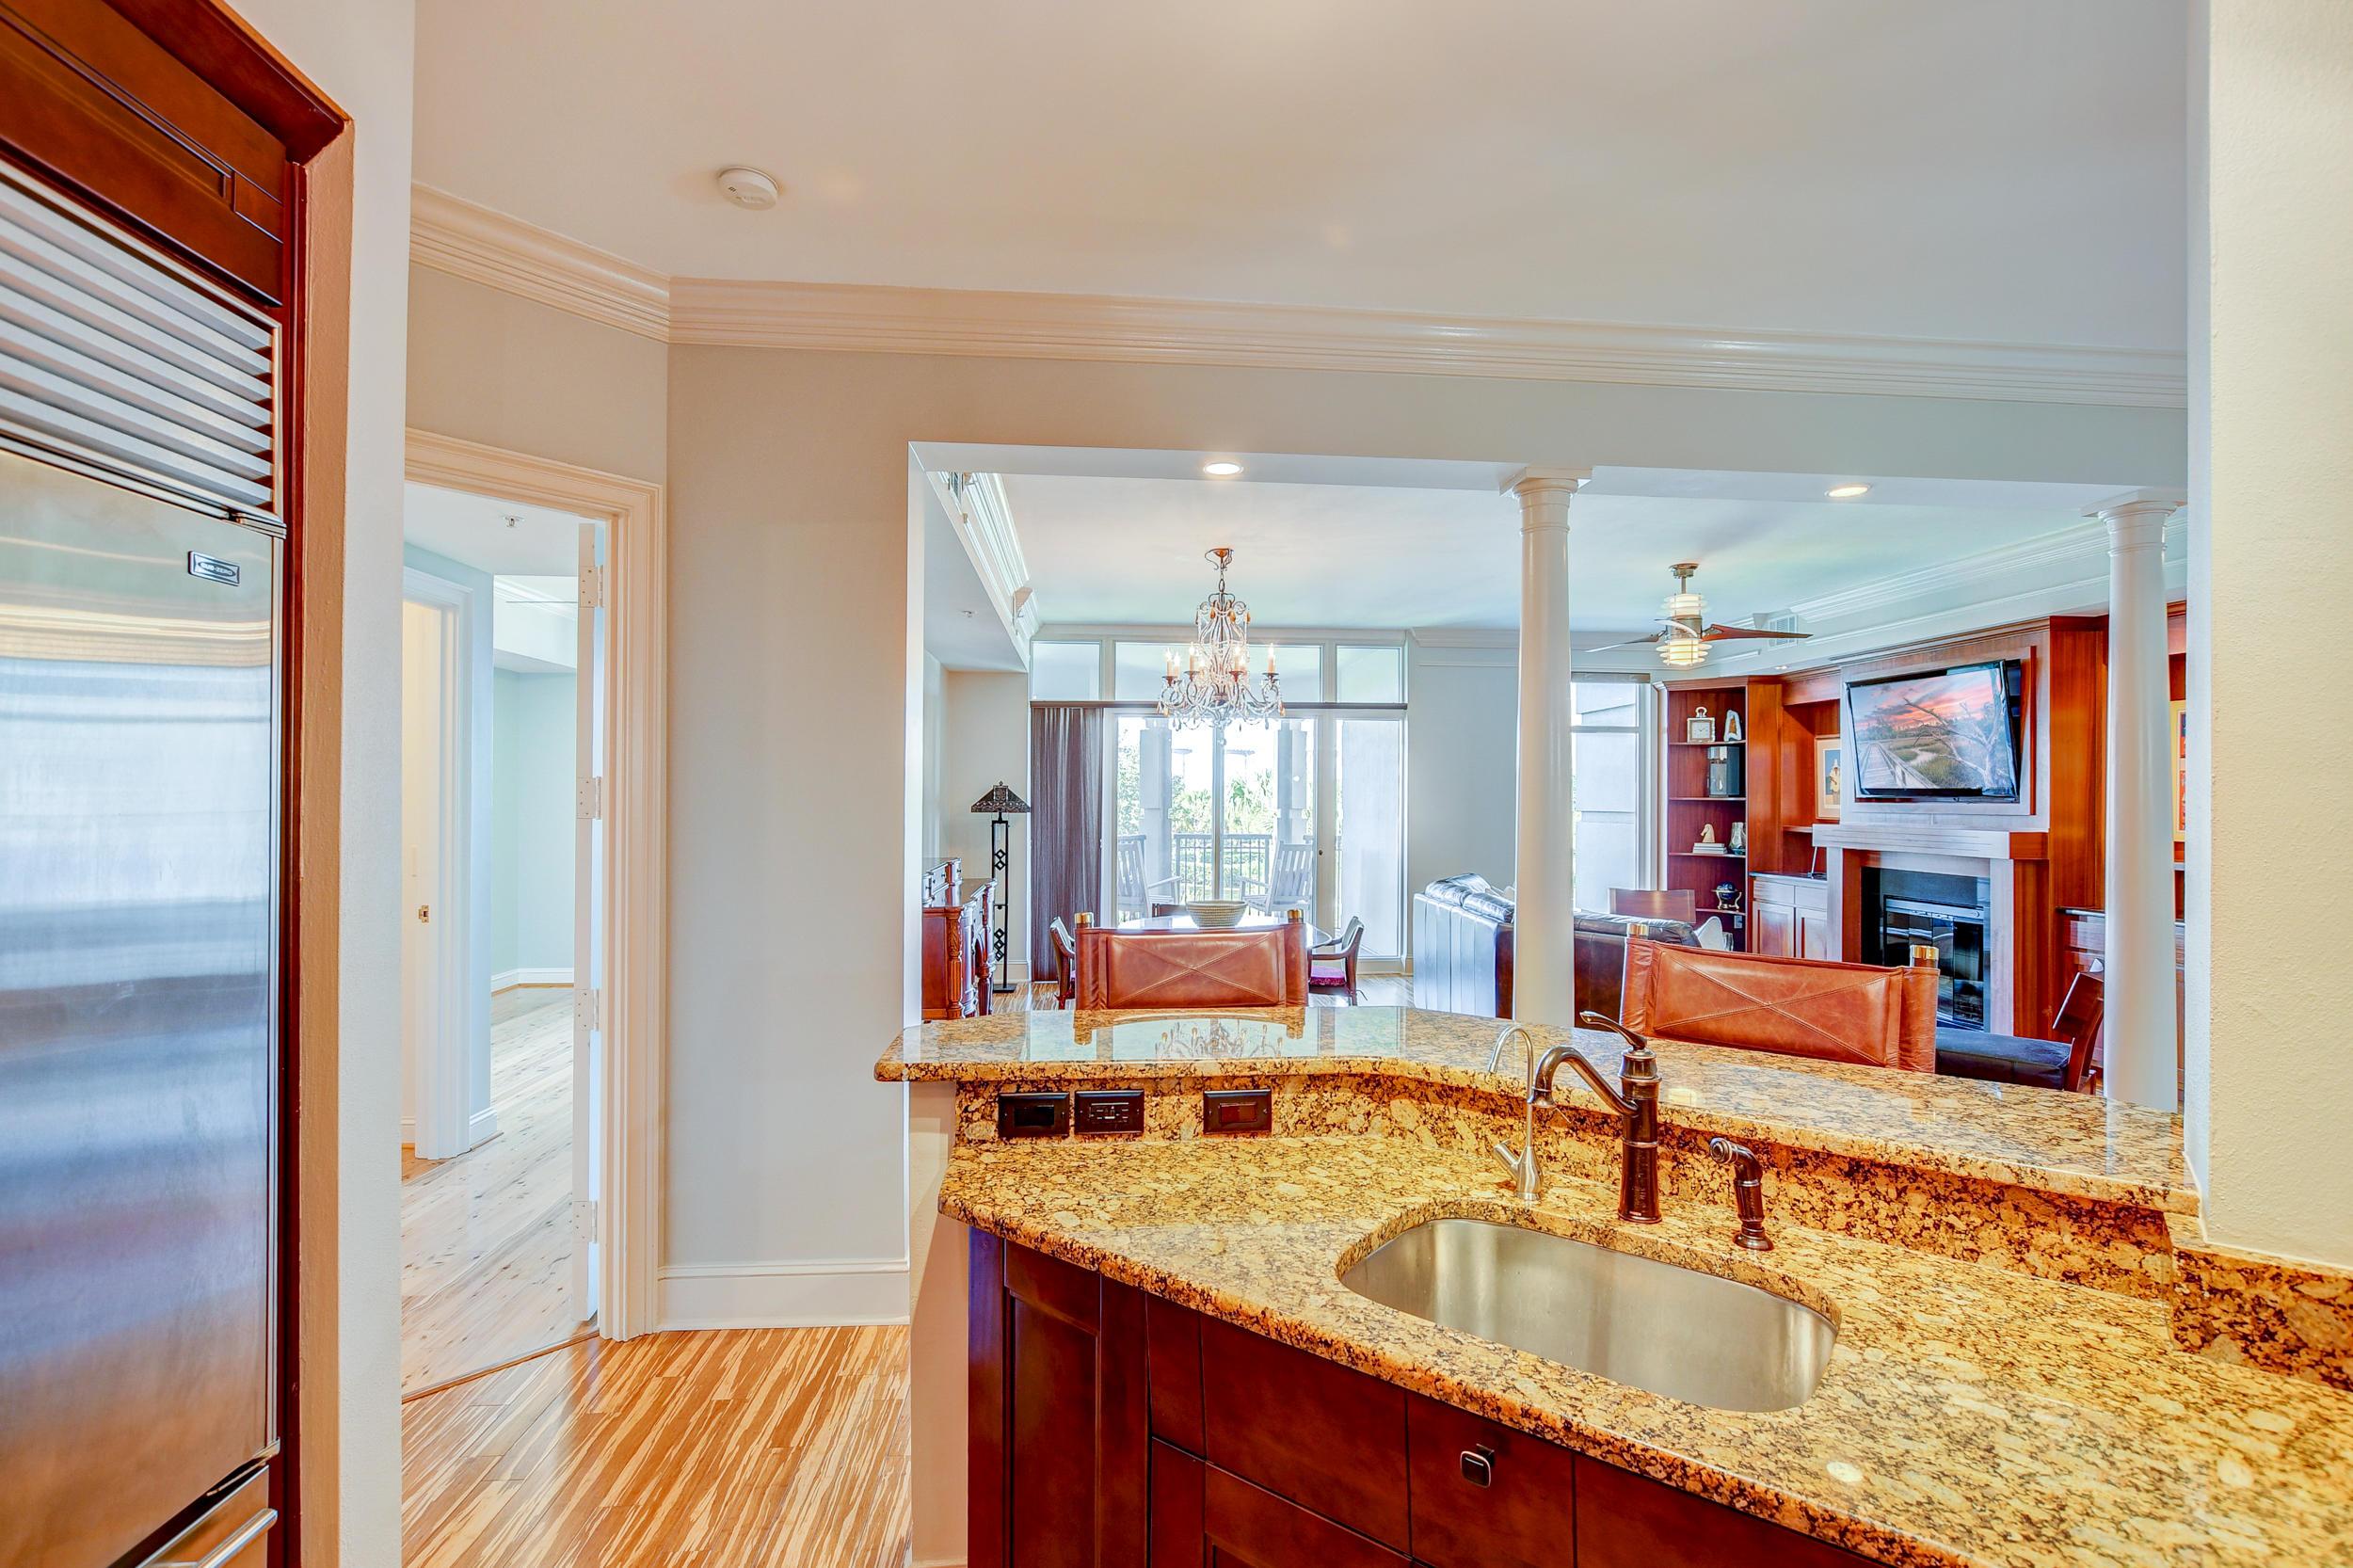 Renaissance On Chas Harbor Homes For Sale - 224 Plaza, Mount Pleasant, SC - 35